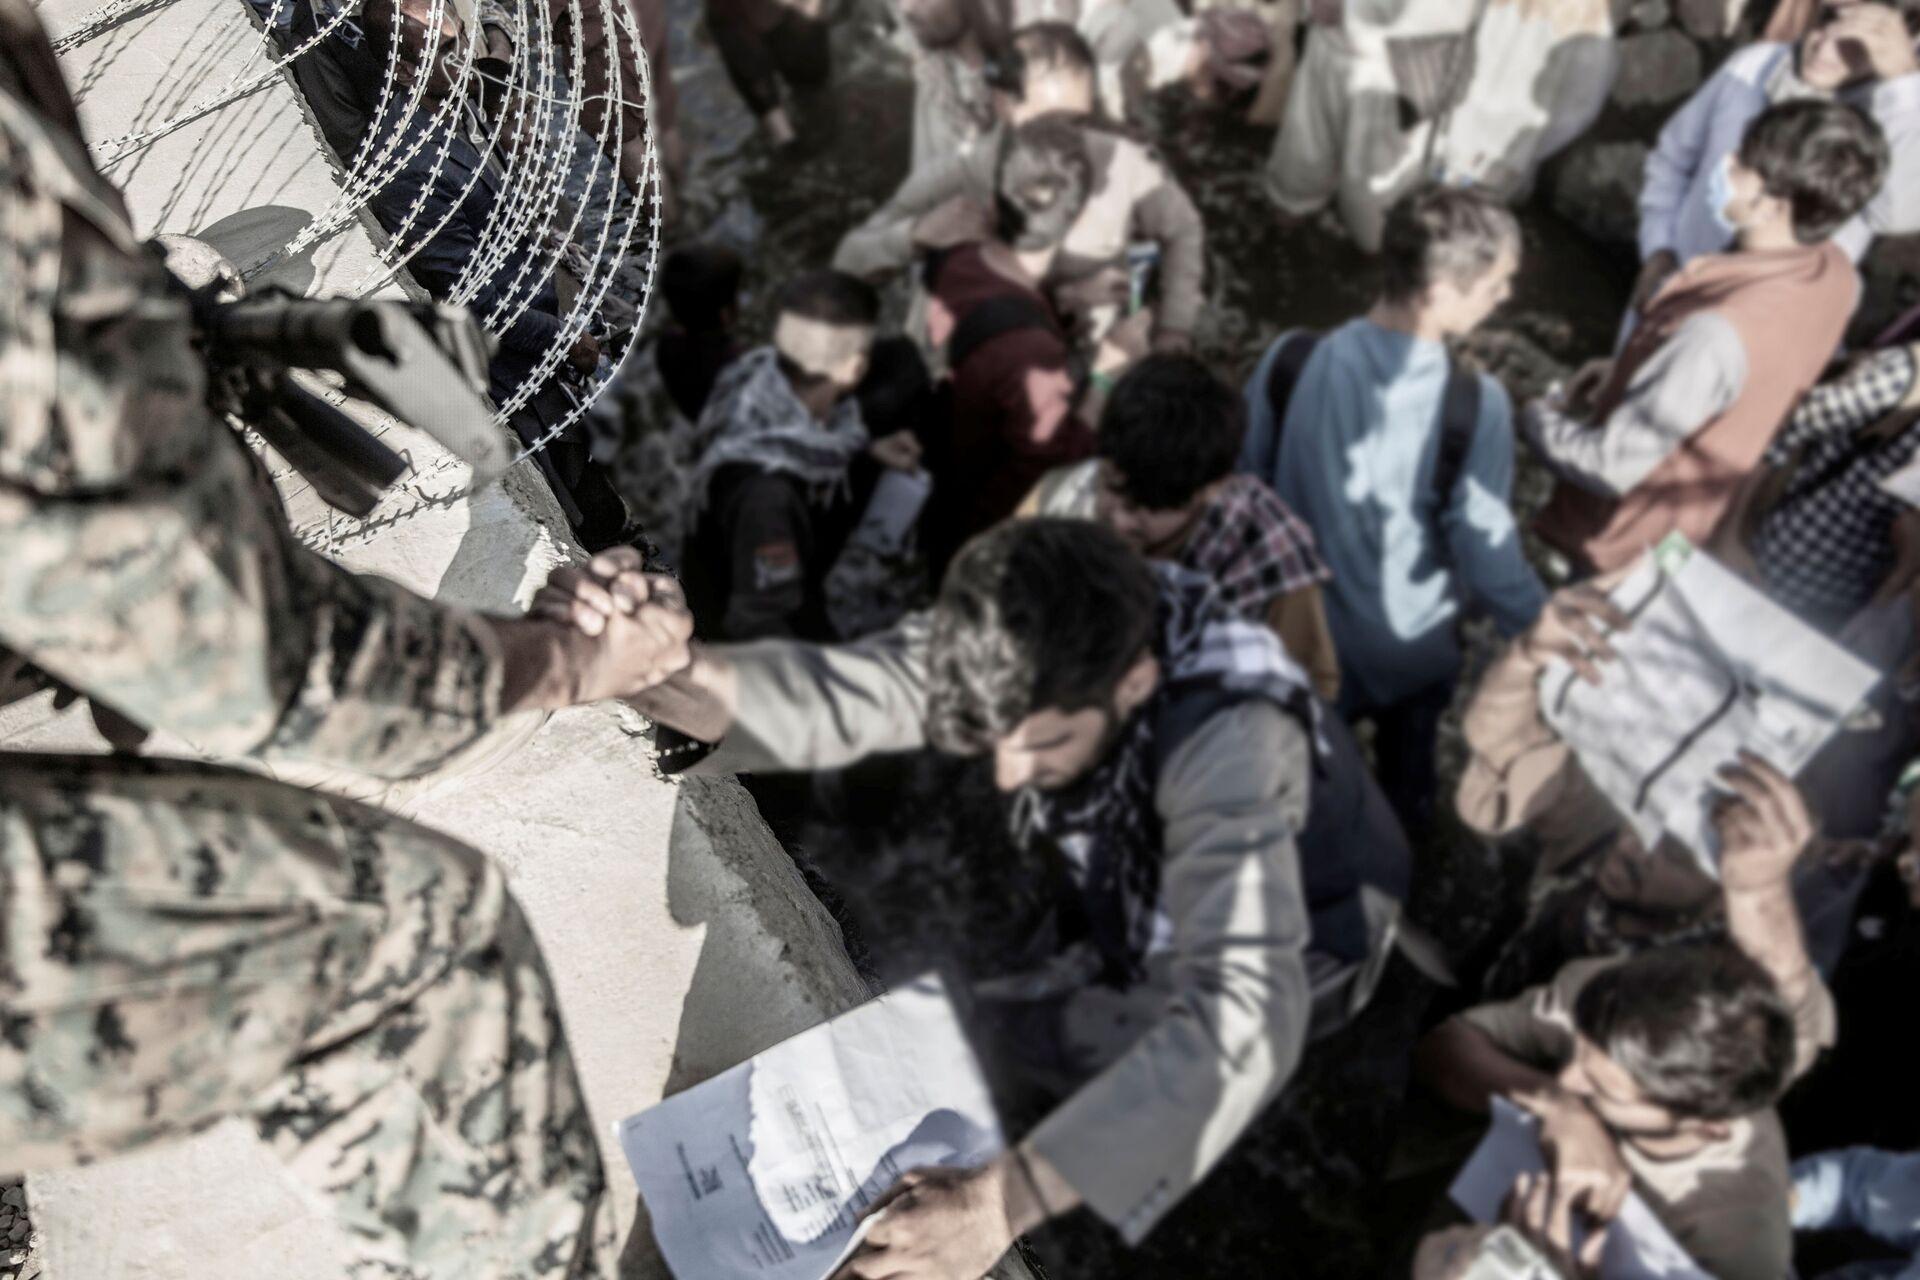 A U.S. Marine assists at an Evacuation Control Check Point (ECC) during an evacuation at Hamid Karzai International Airport, Kabul, Afghanistan, August 26, 2021.  - Sputnik International, 1920, 07.09.2021